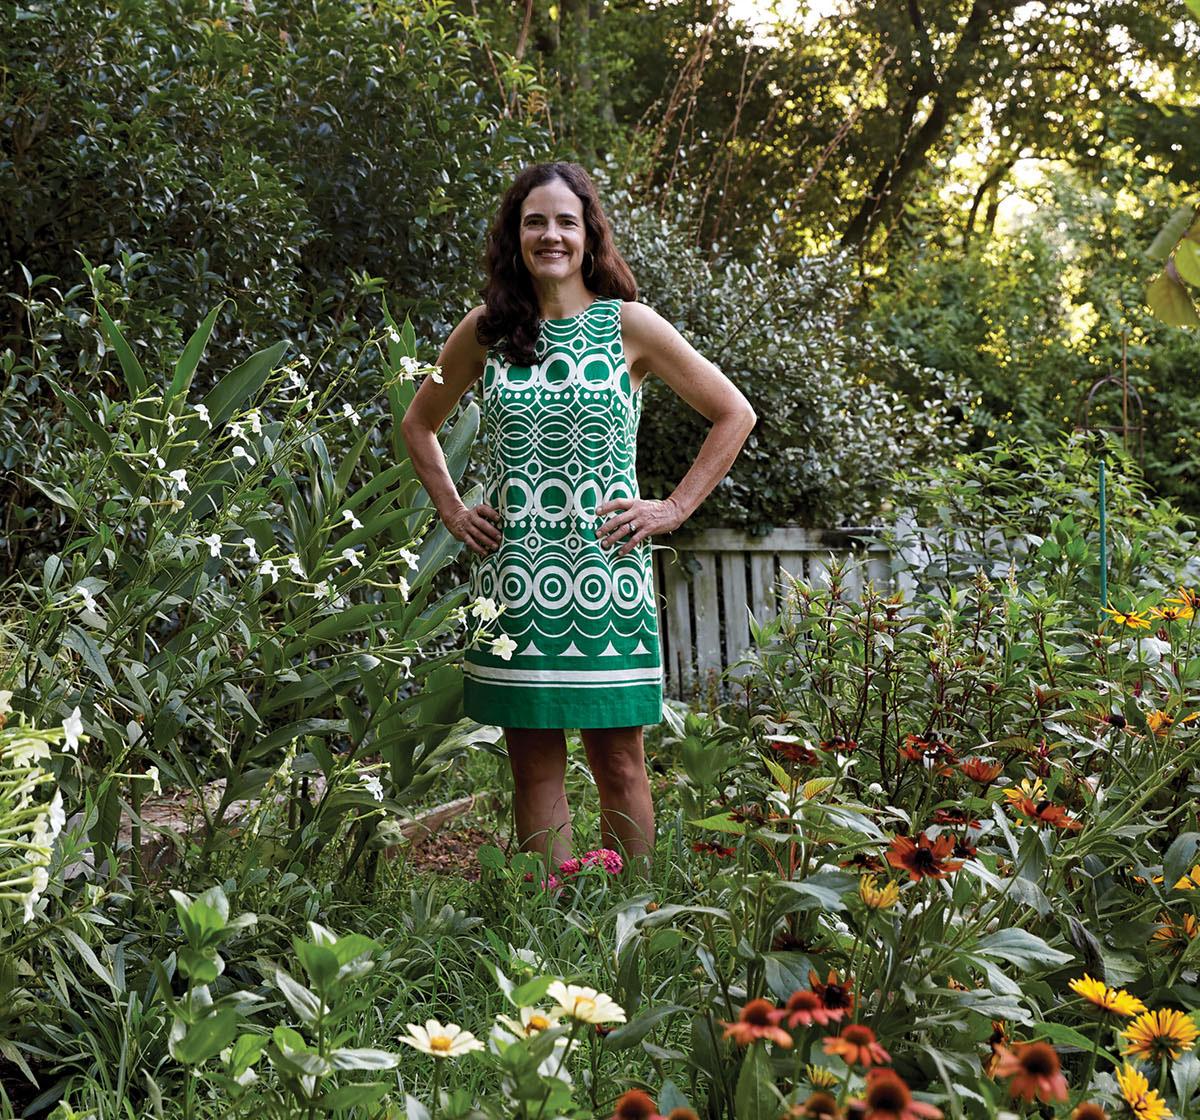 Floral designer Kappi Naftel stands in an abundant summer flower garden. She wears a green and white patterend sleeveless shift dress